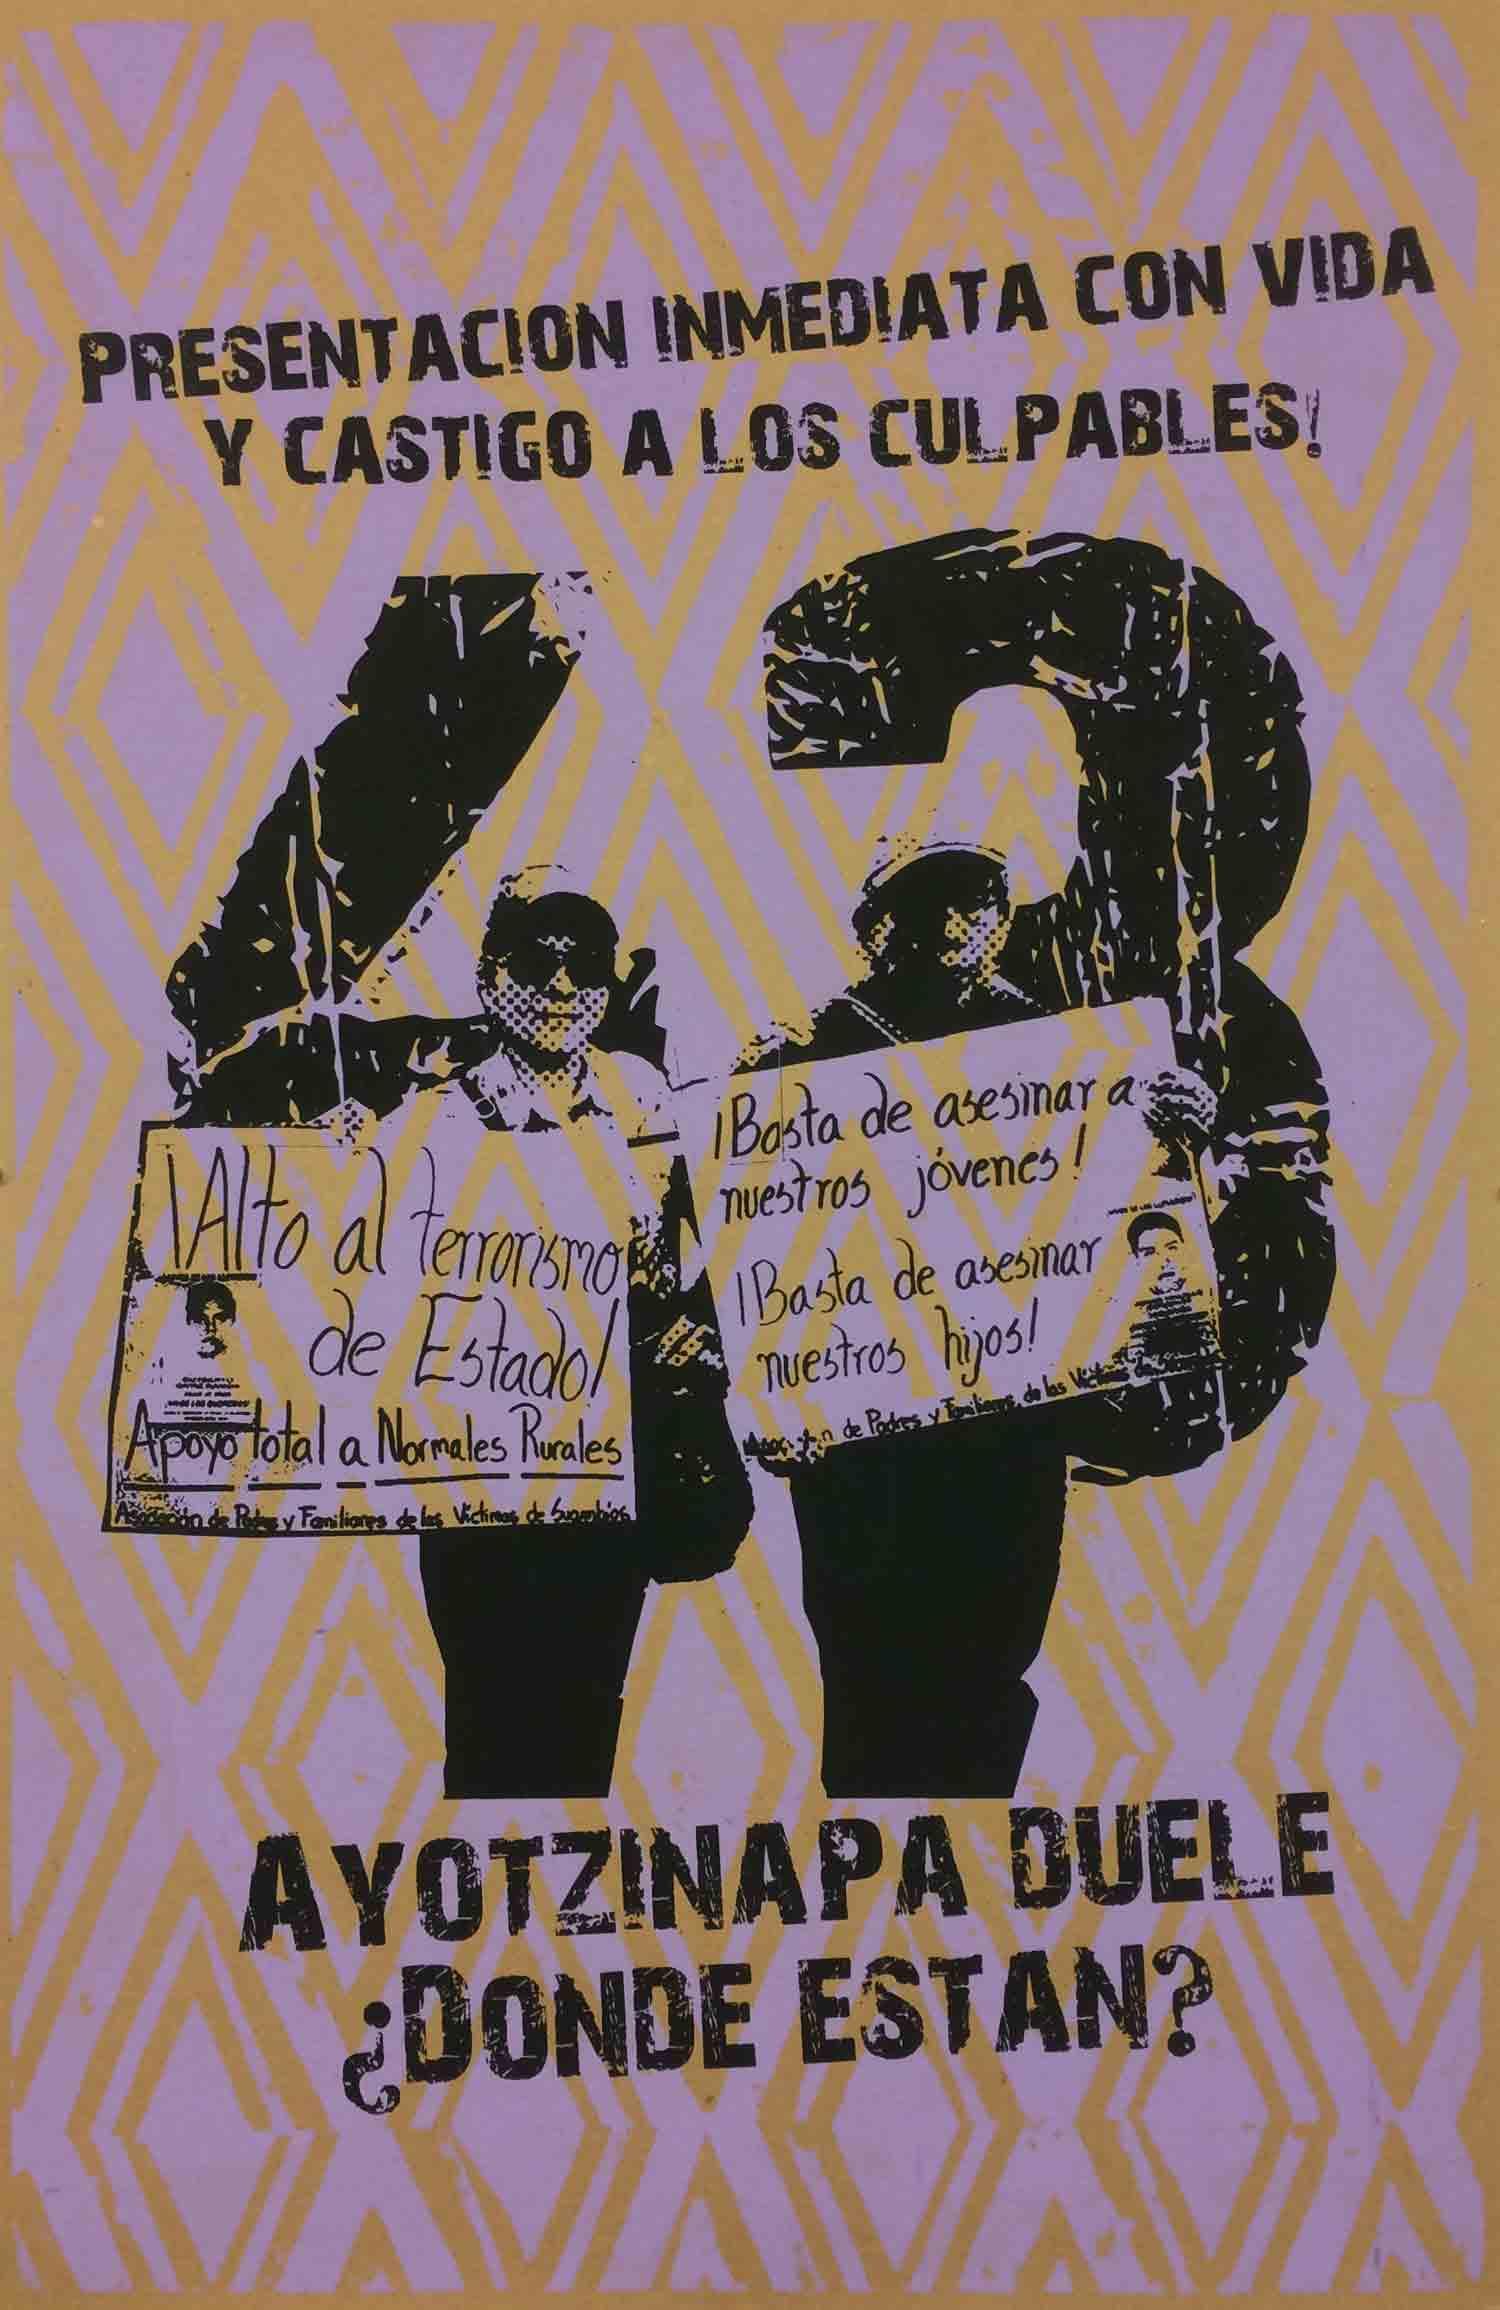 Ayotzinapa en pie de Lucha